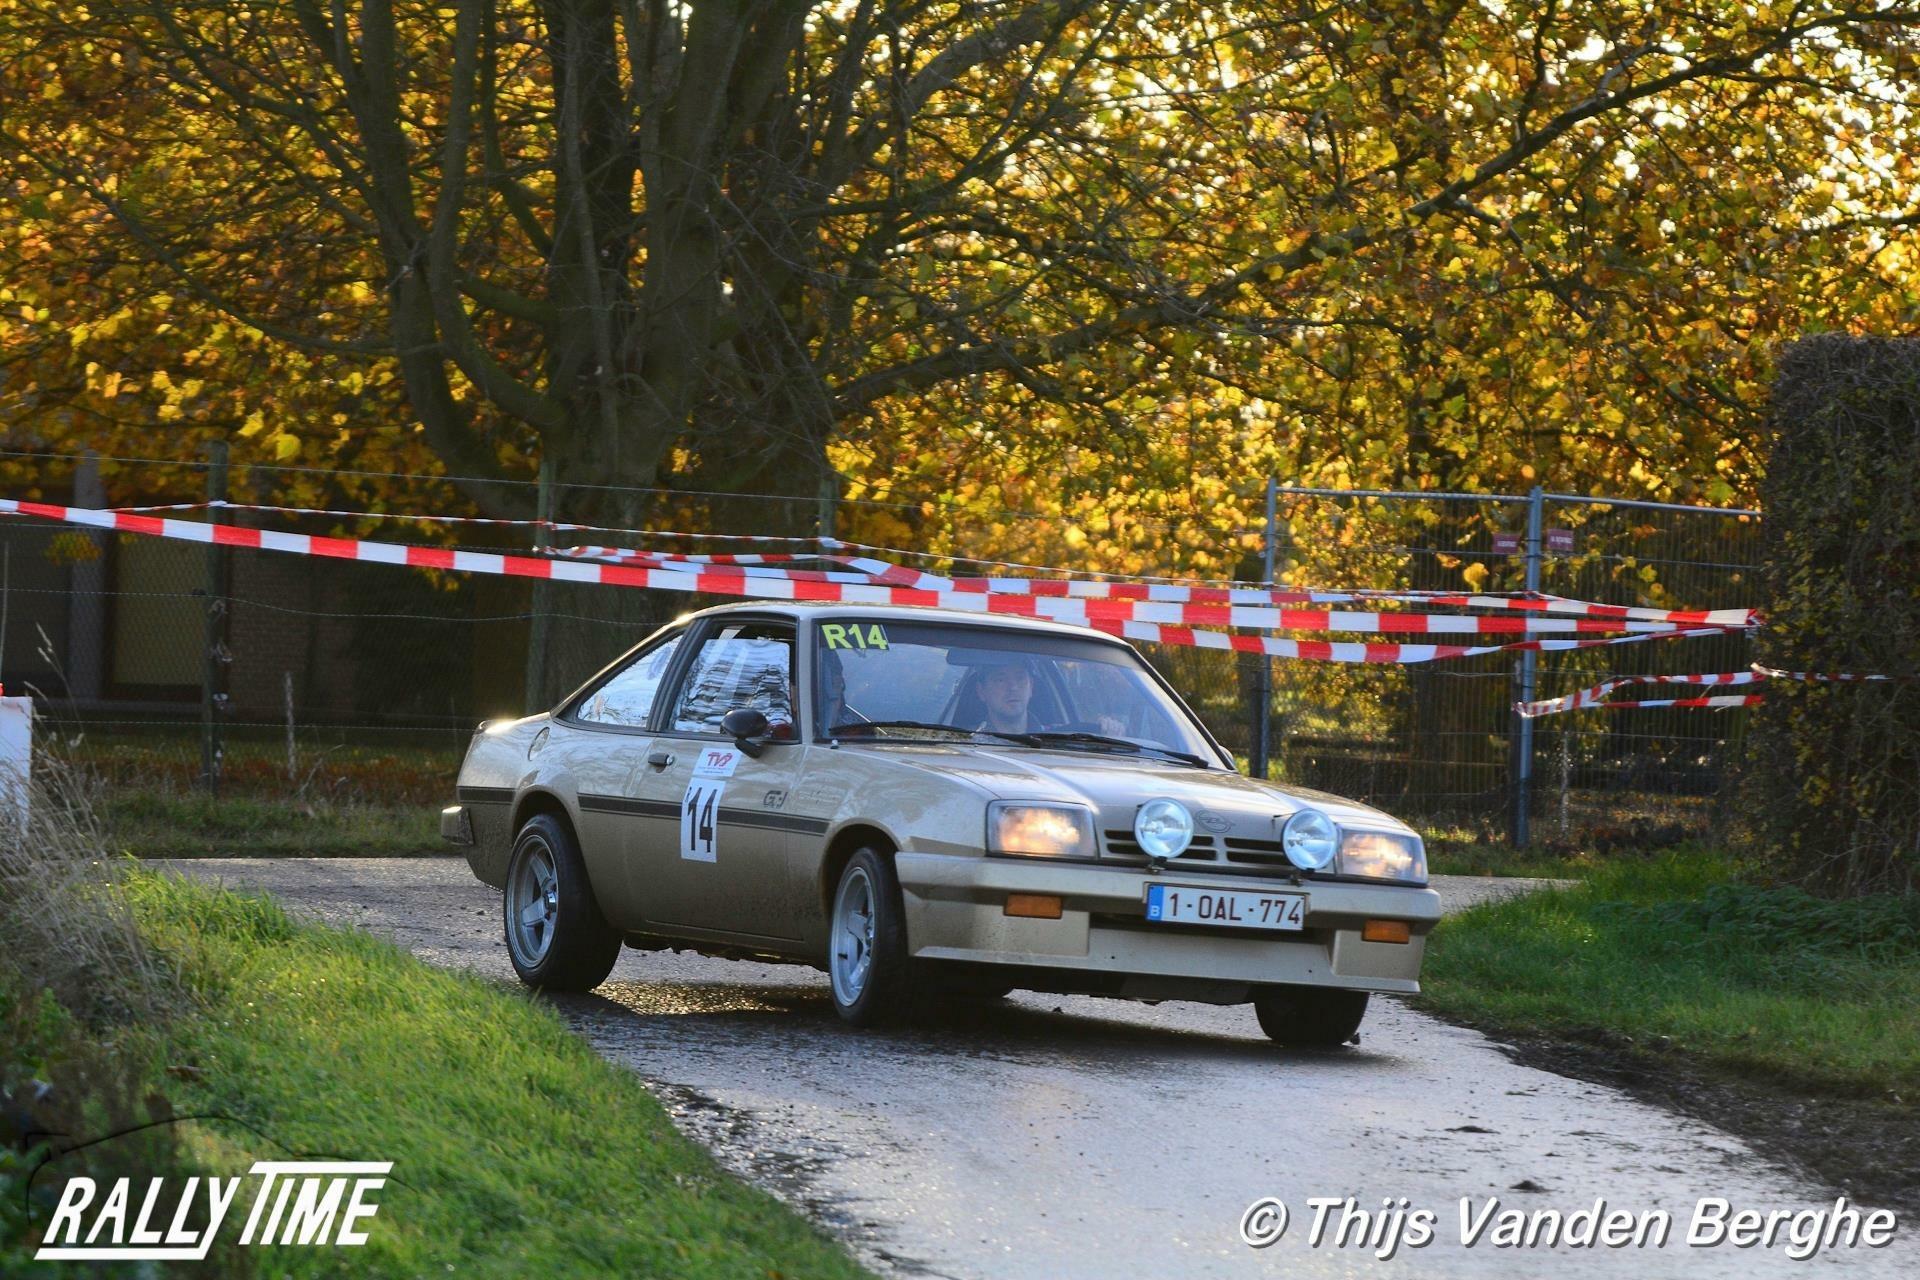 1040 - Opel - Manta - 1982